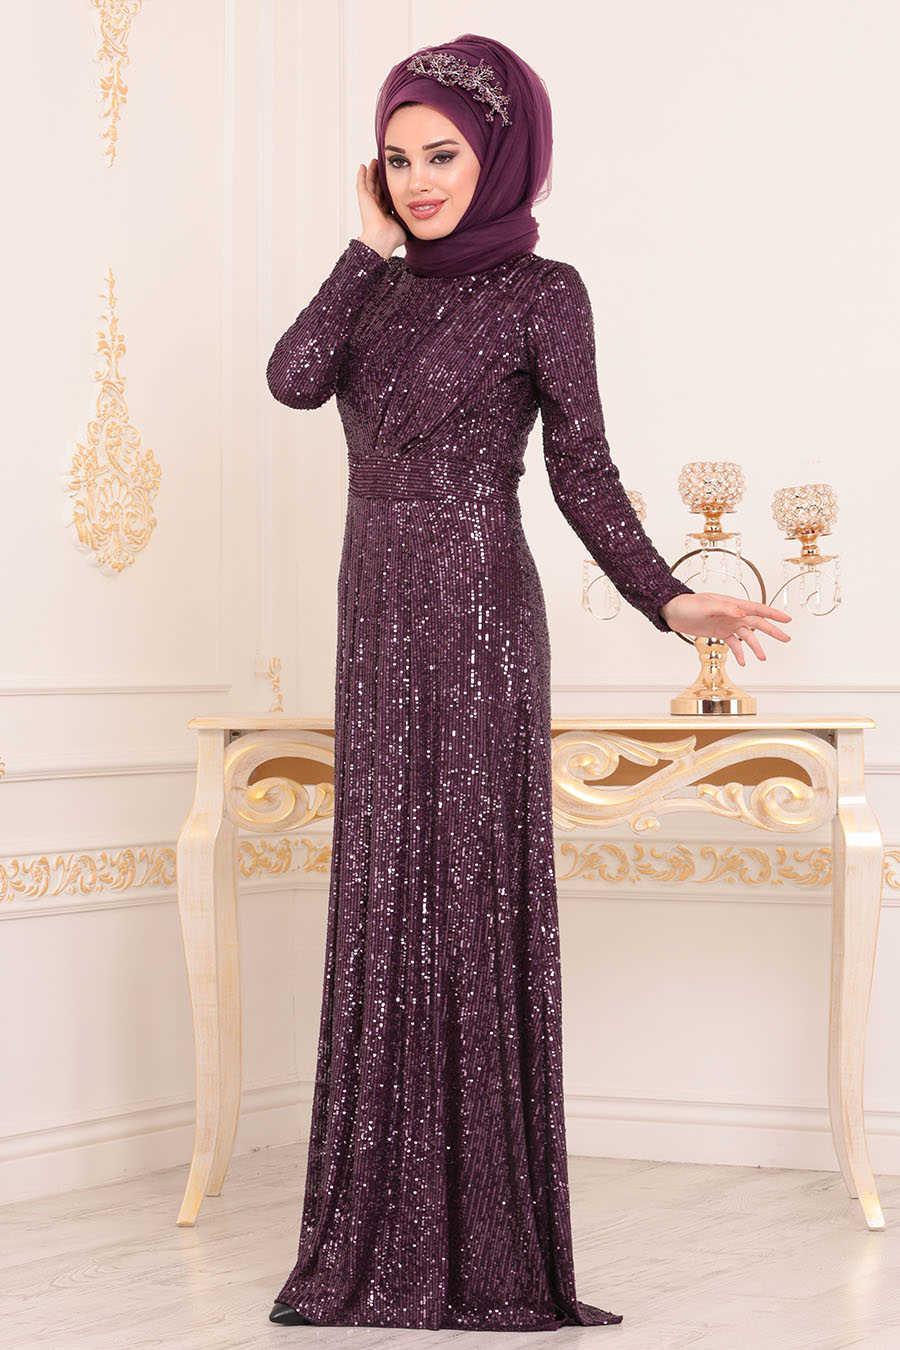 Neva Style - Plum Color Hijab Evening Dress 9106MU